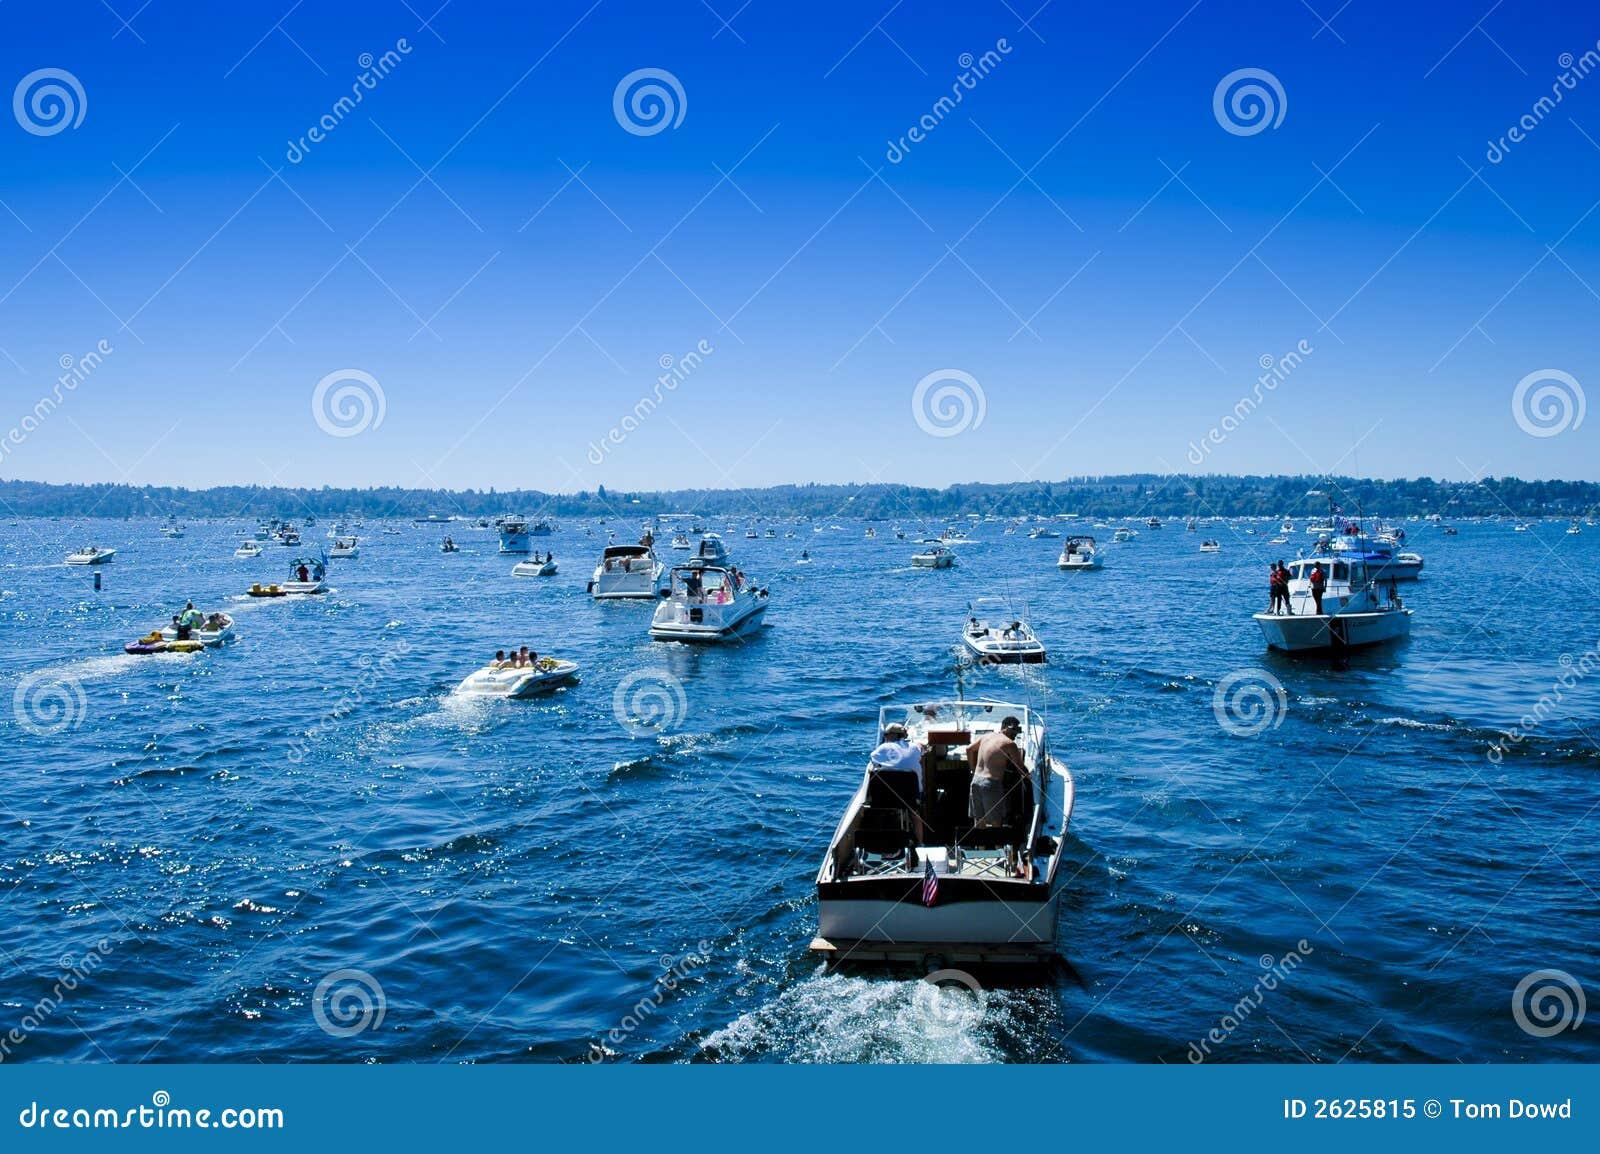 Boating traffic jam sea fair lake washington stock image for Fishing license wa